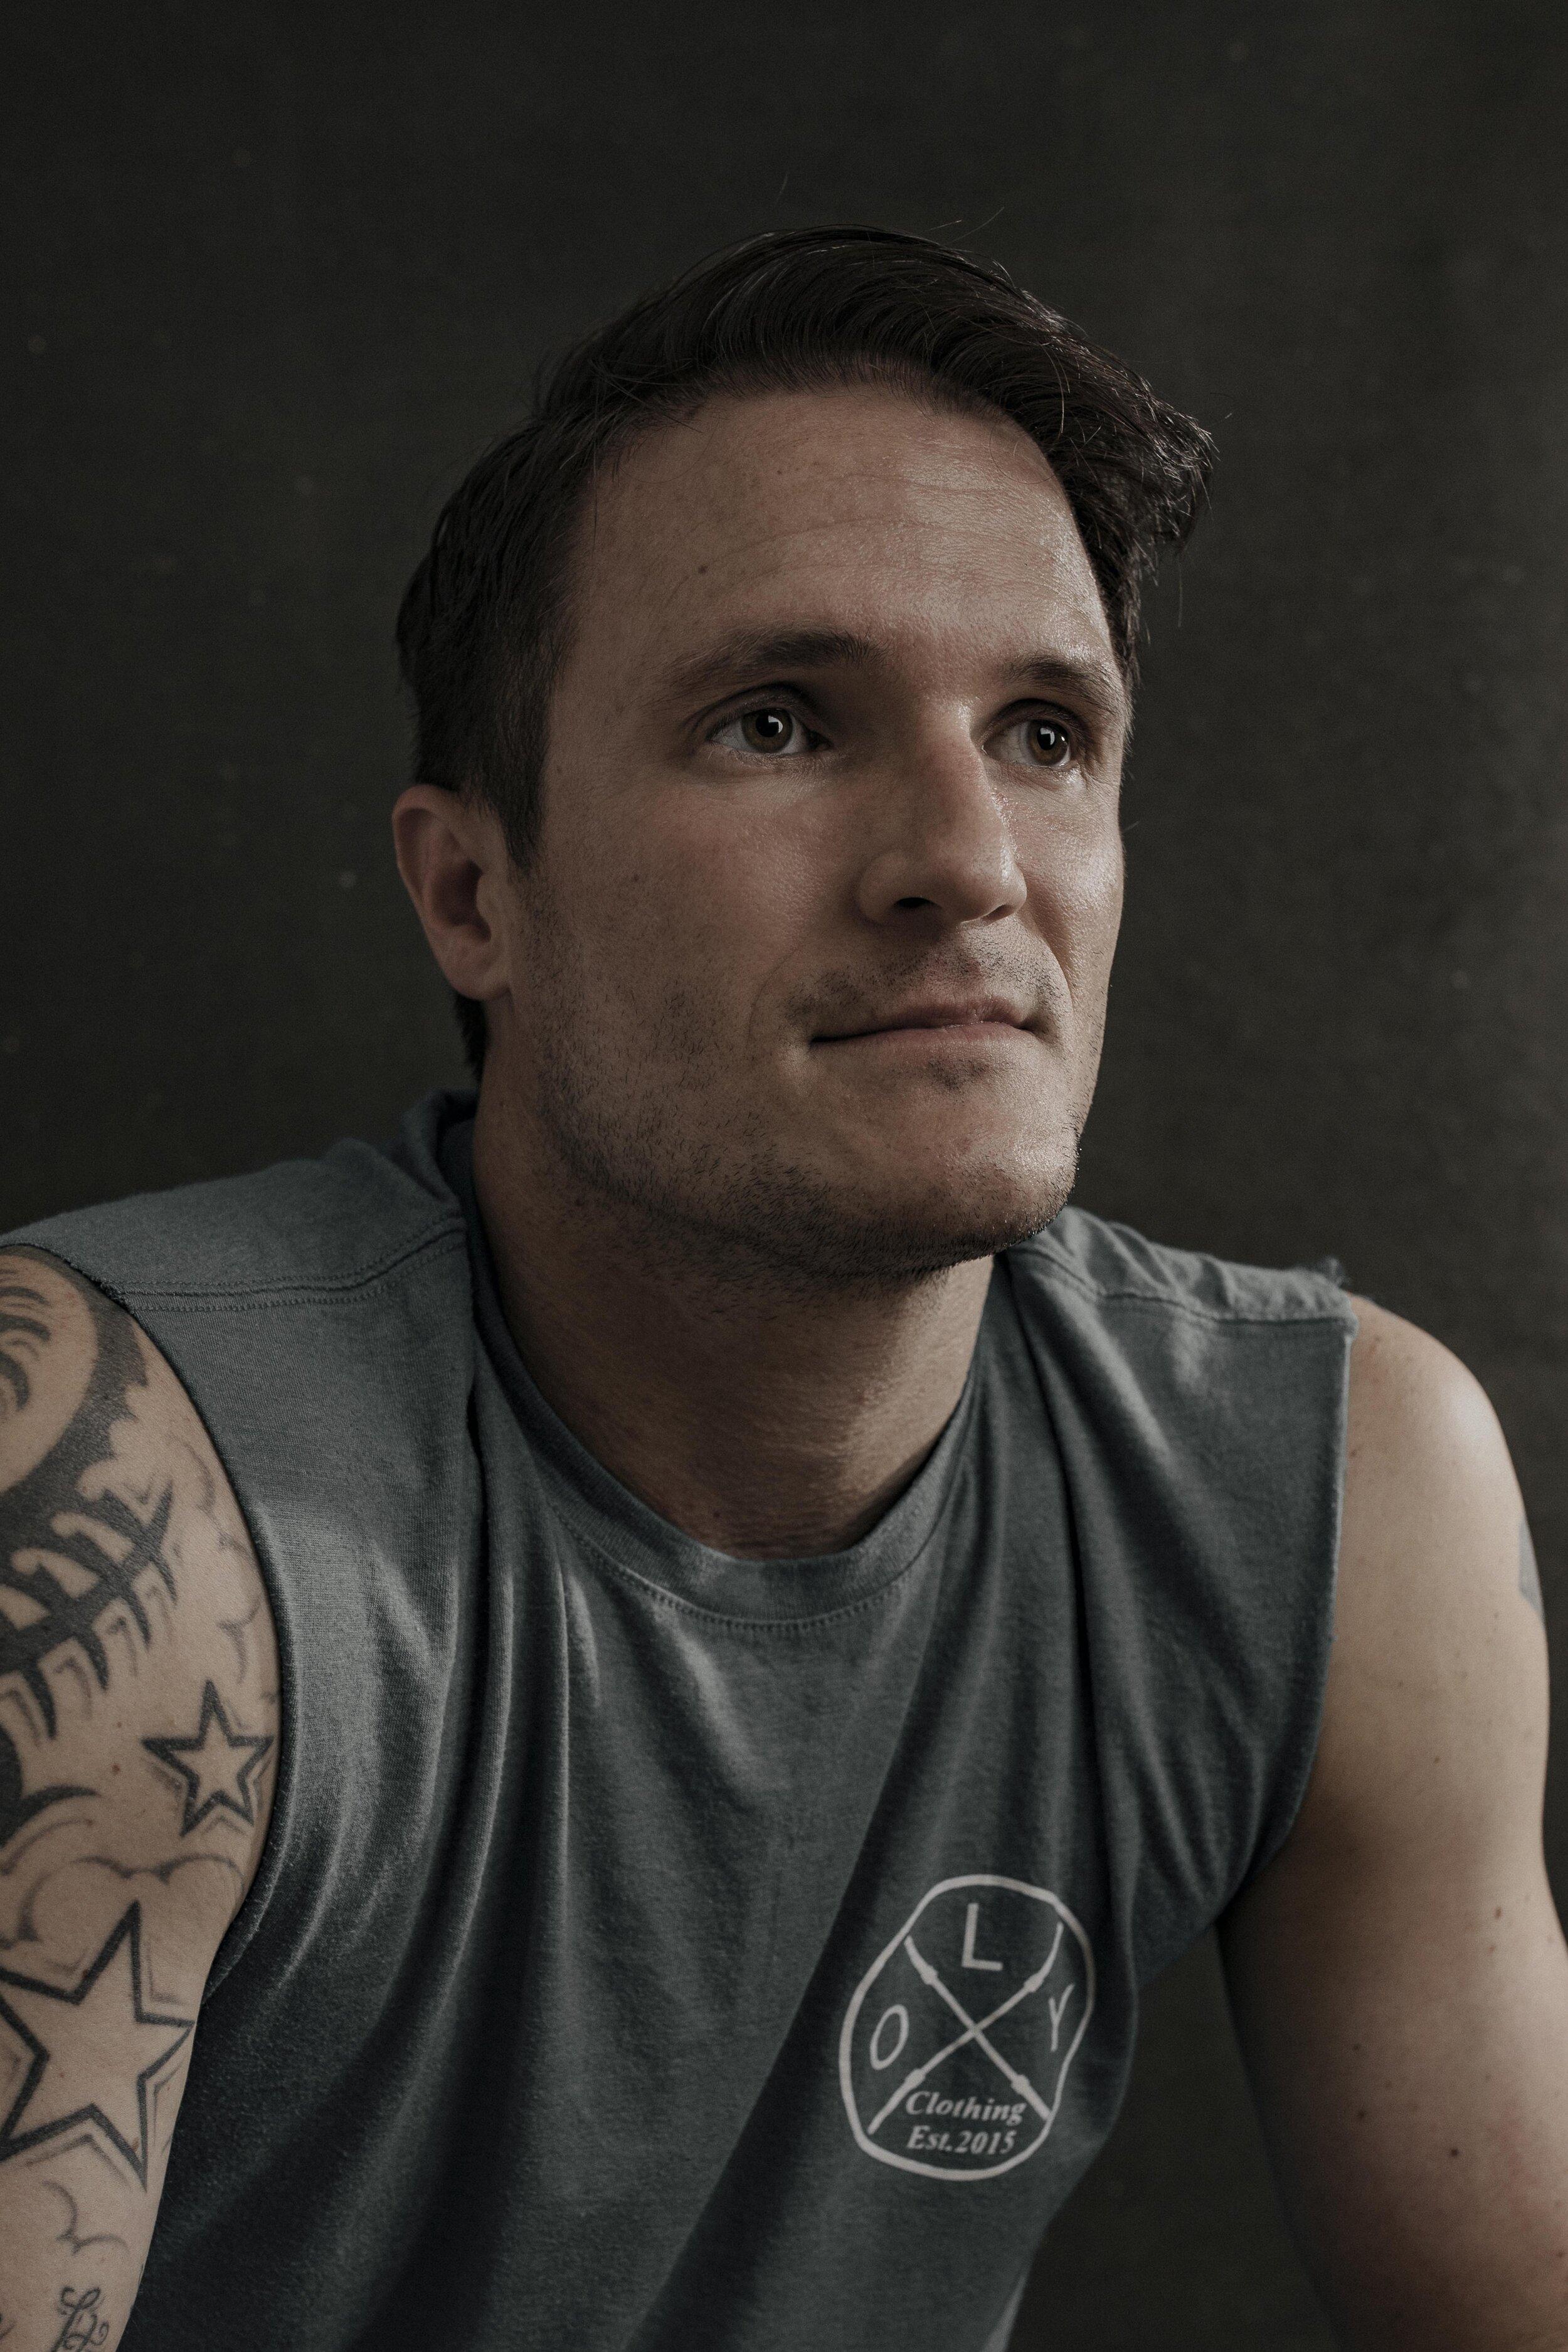 Stuart_mack_athlete_adaptive.jpg